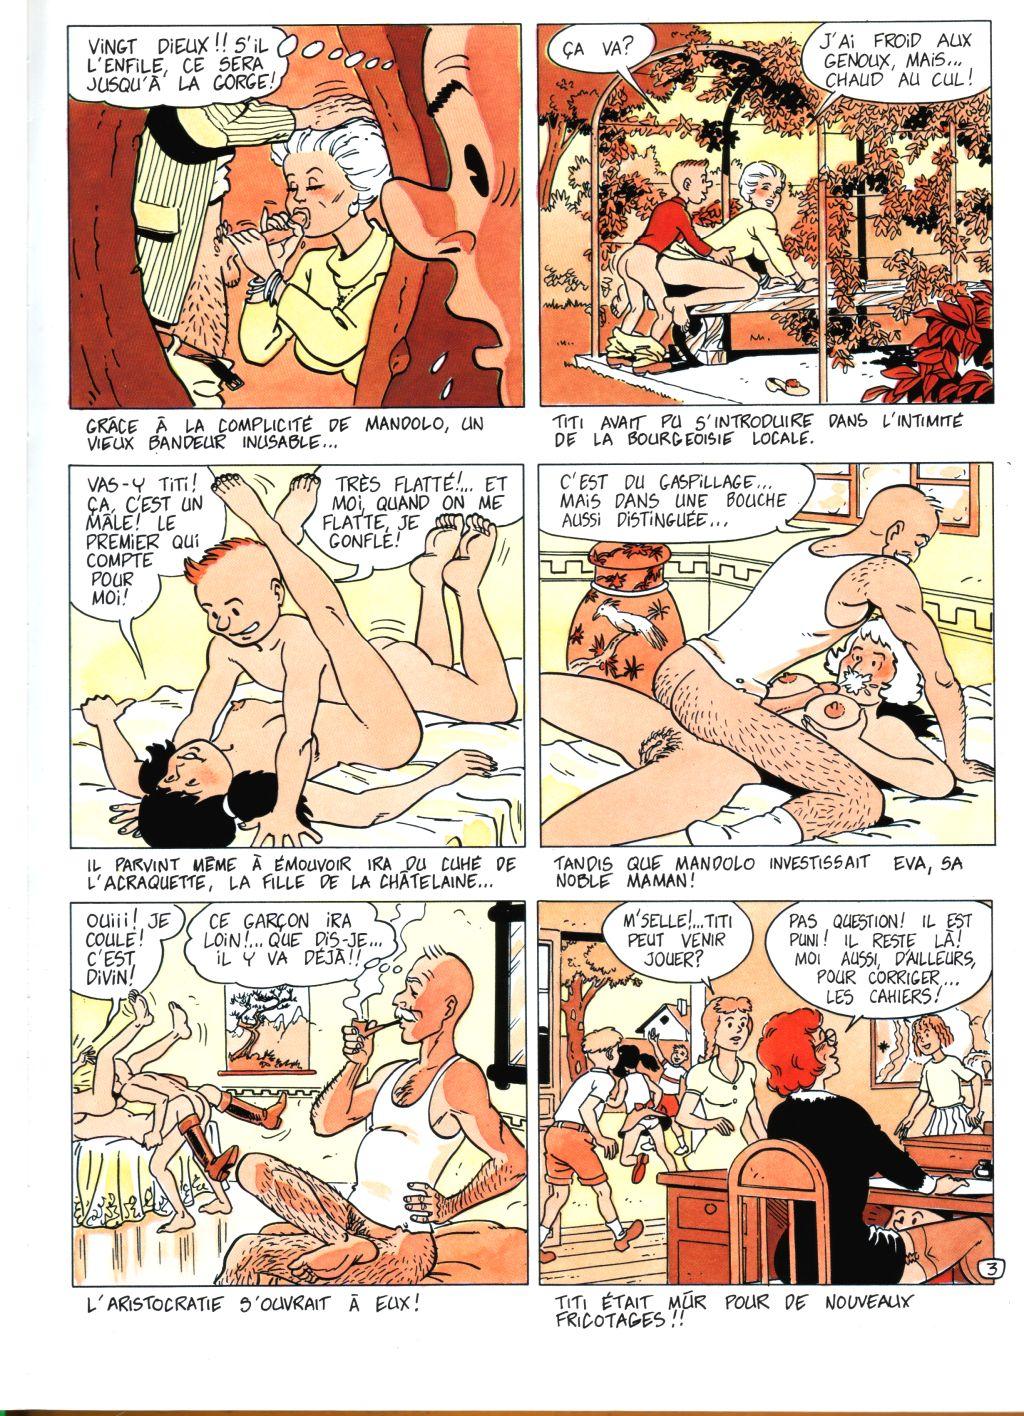 bd et illustration adulte porno sexe